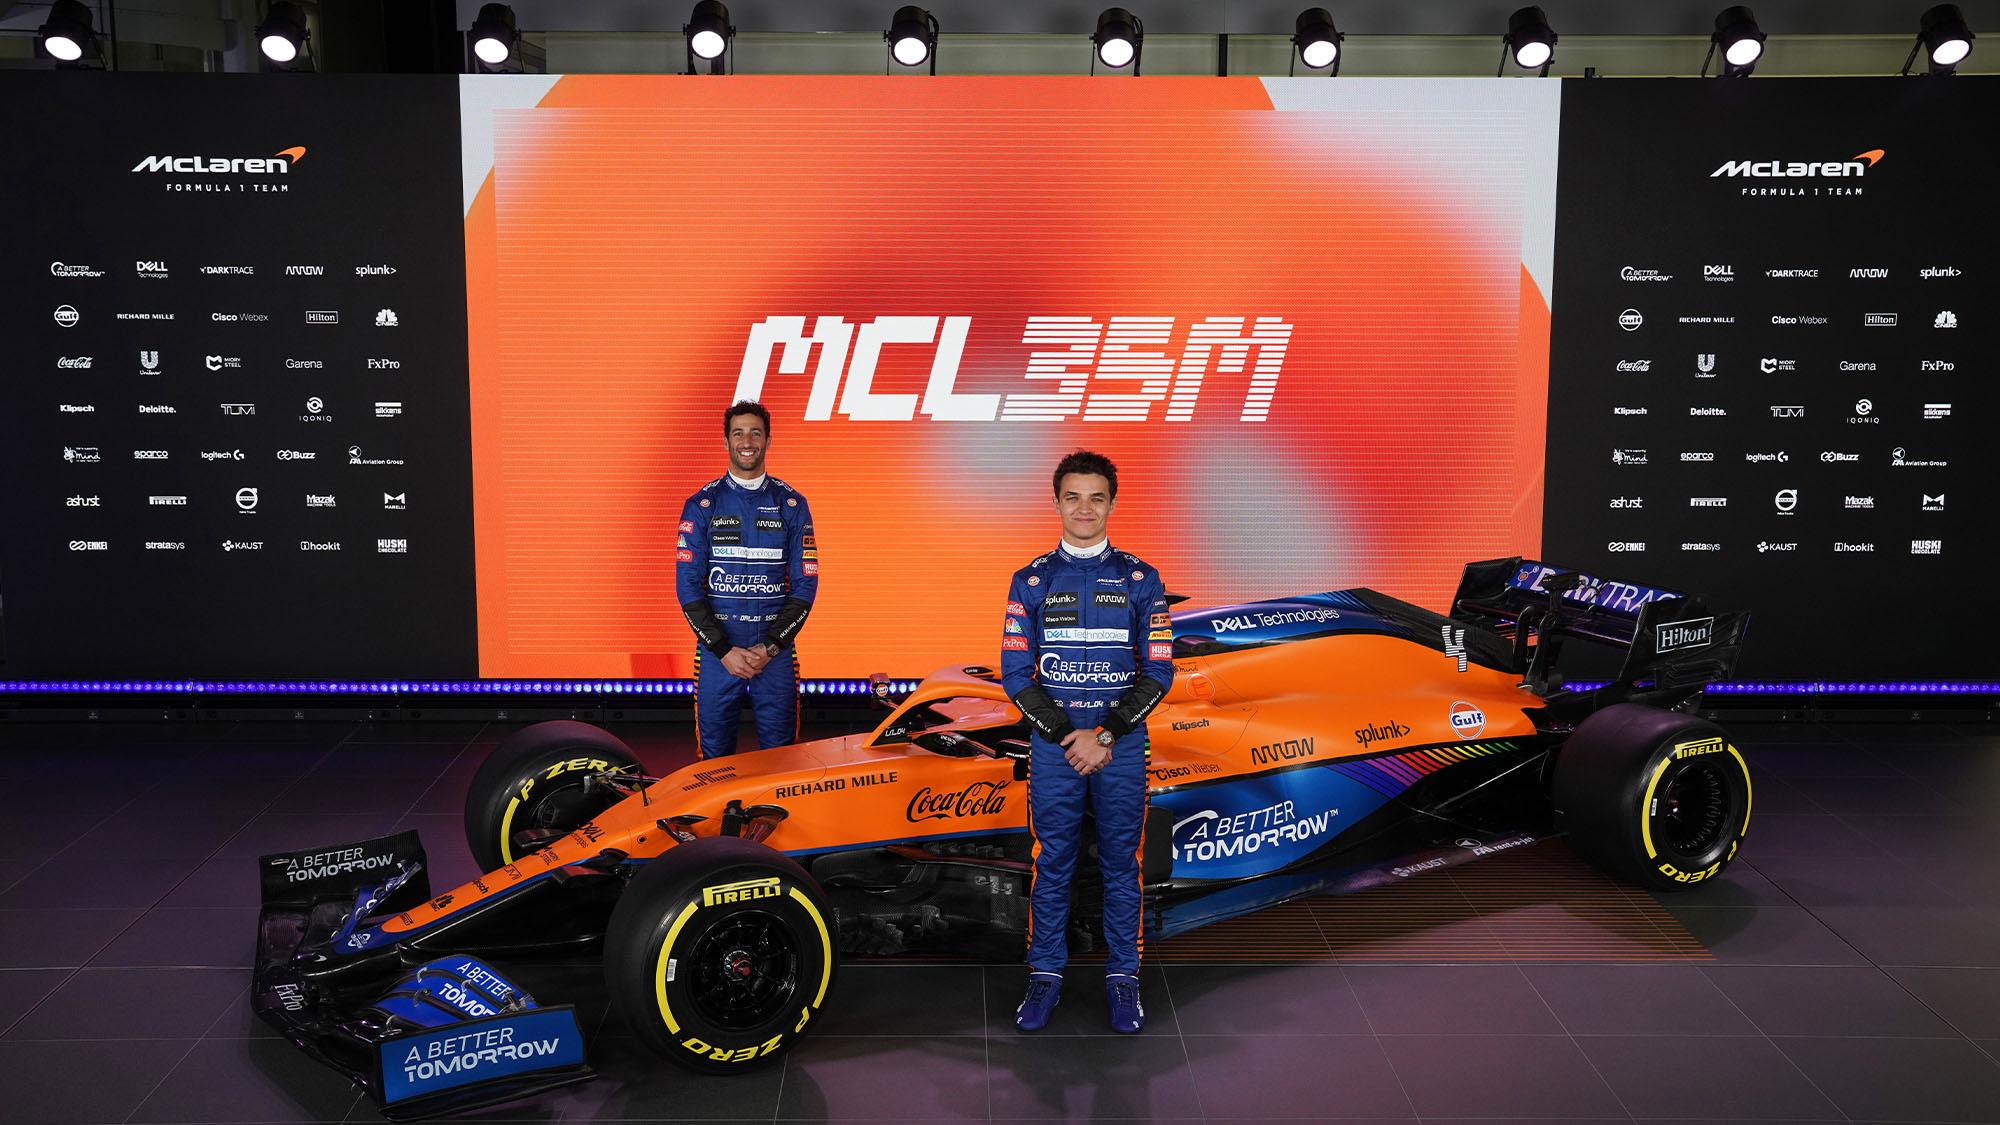 McLaren MCL35M 2